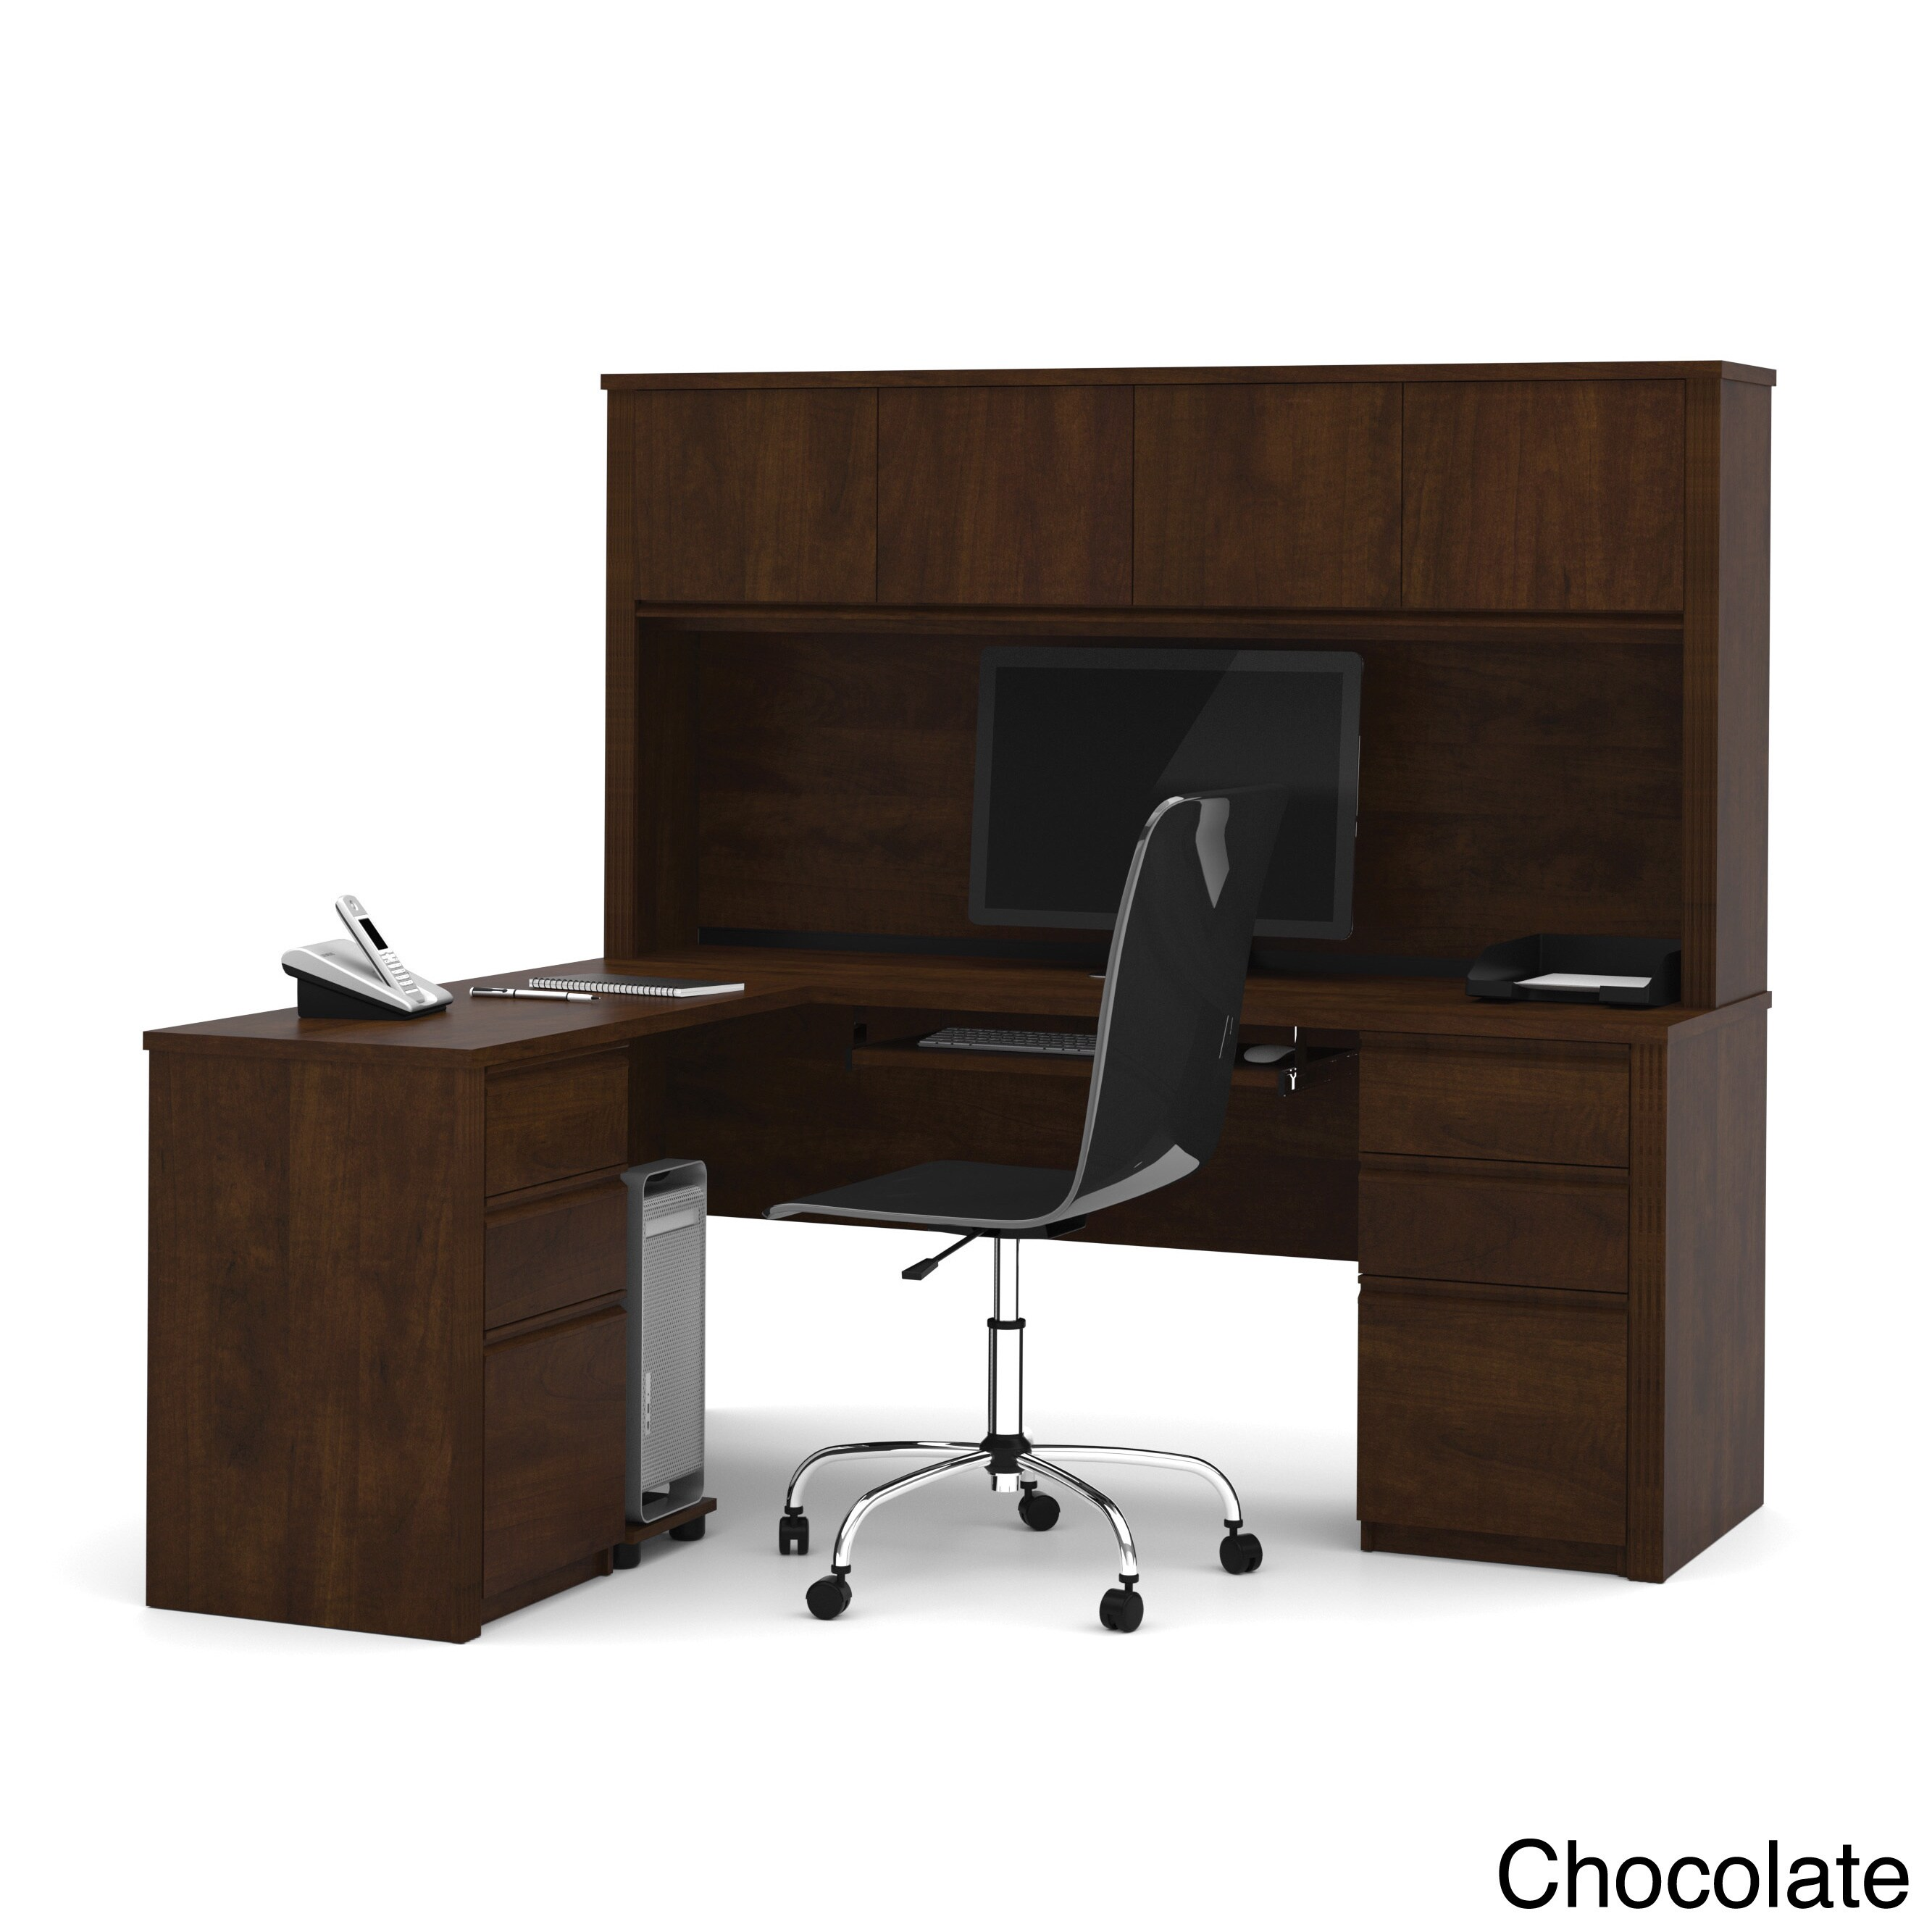 Strange Bestar Prestige Plus L Shaped Desk With Hutch Download Free Architecture Designs Scobabritishbridgeorg